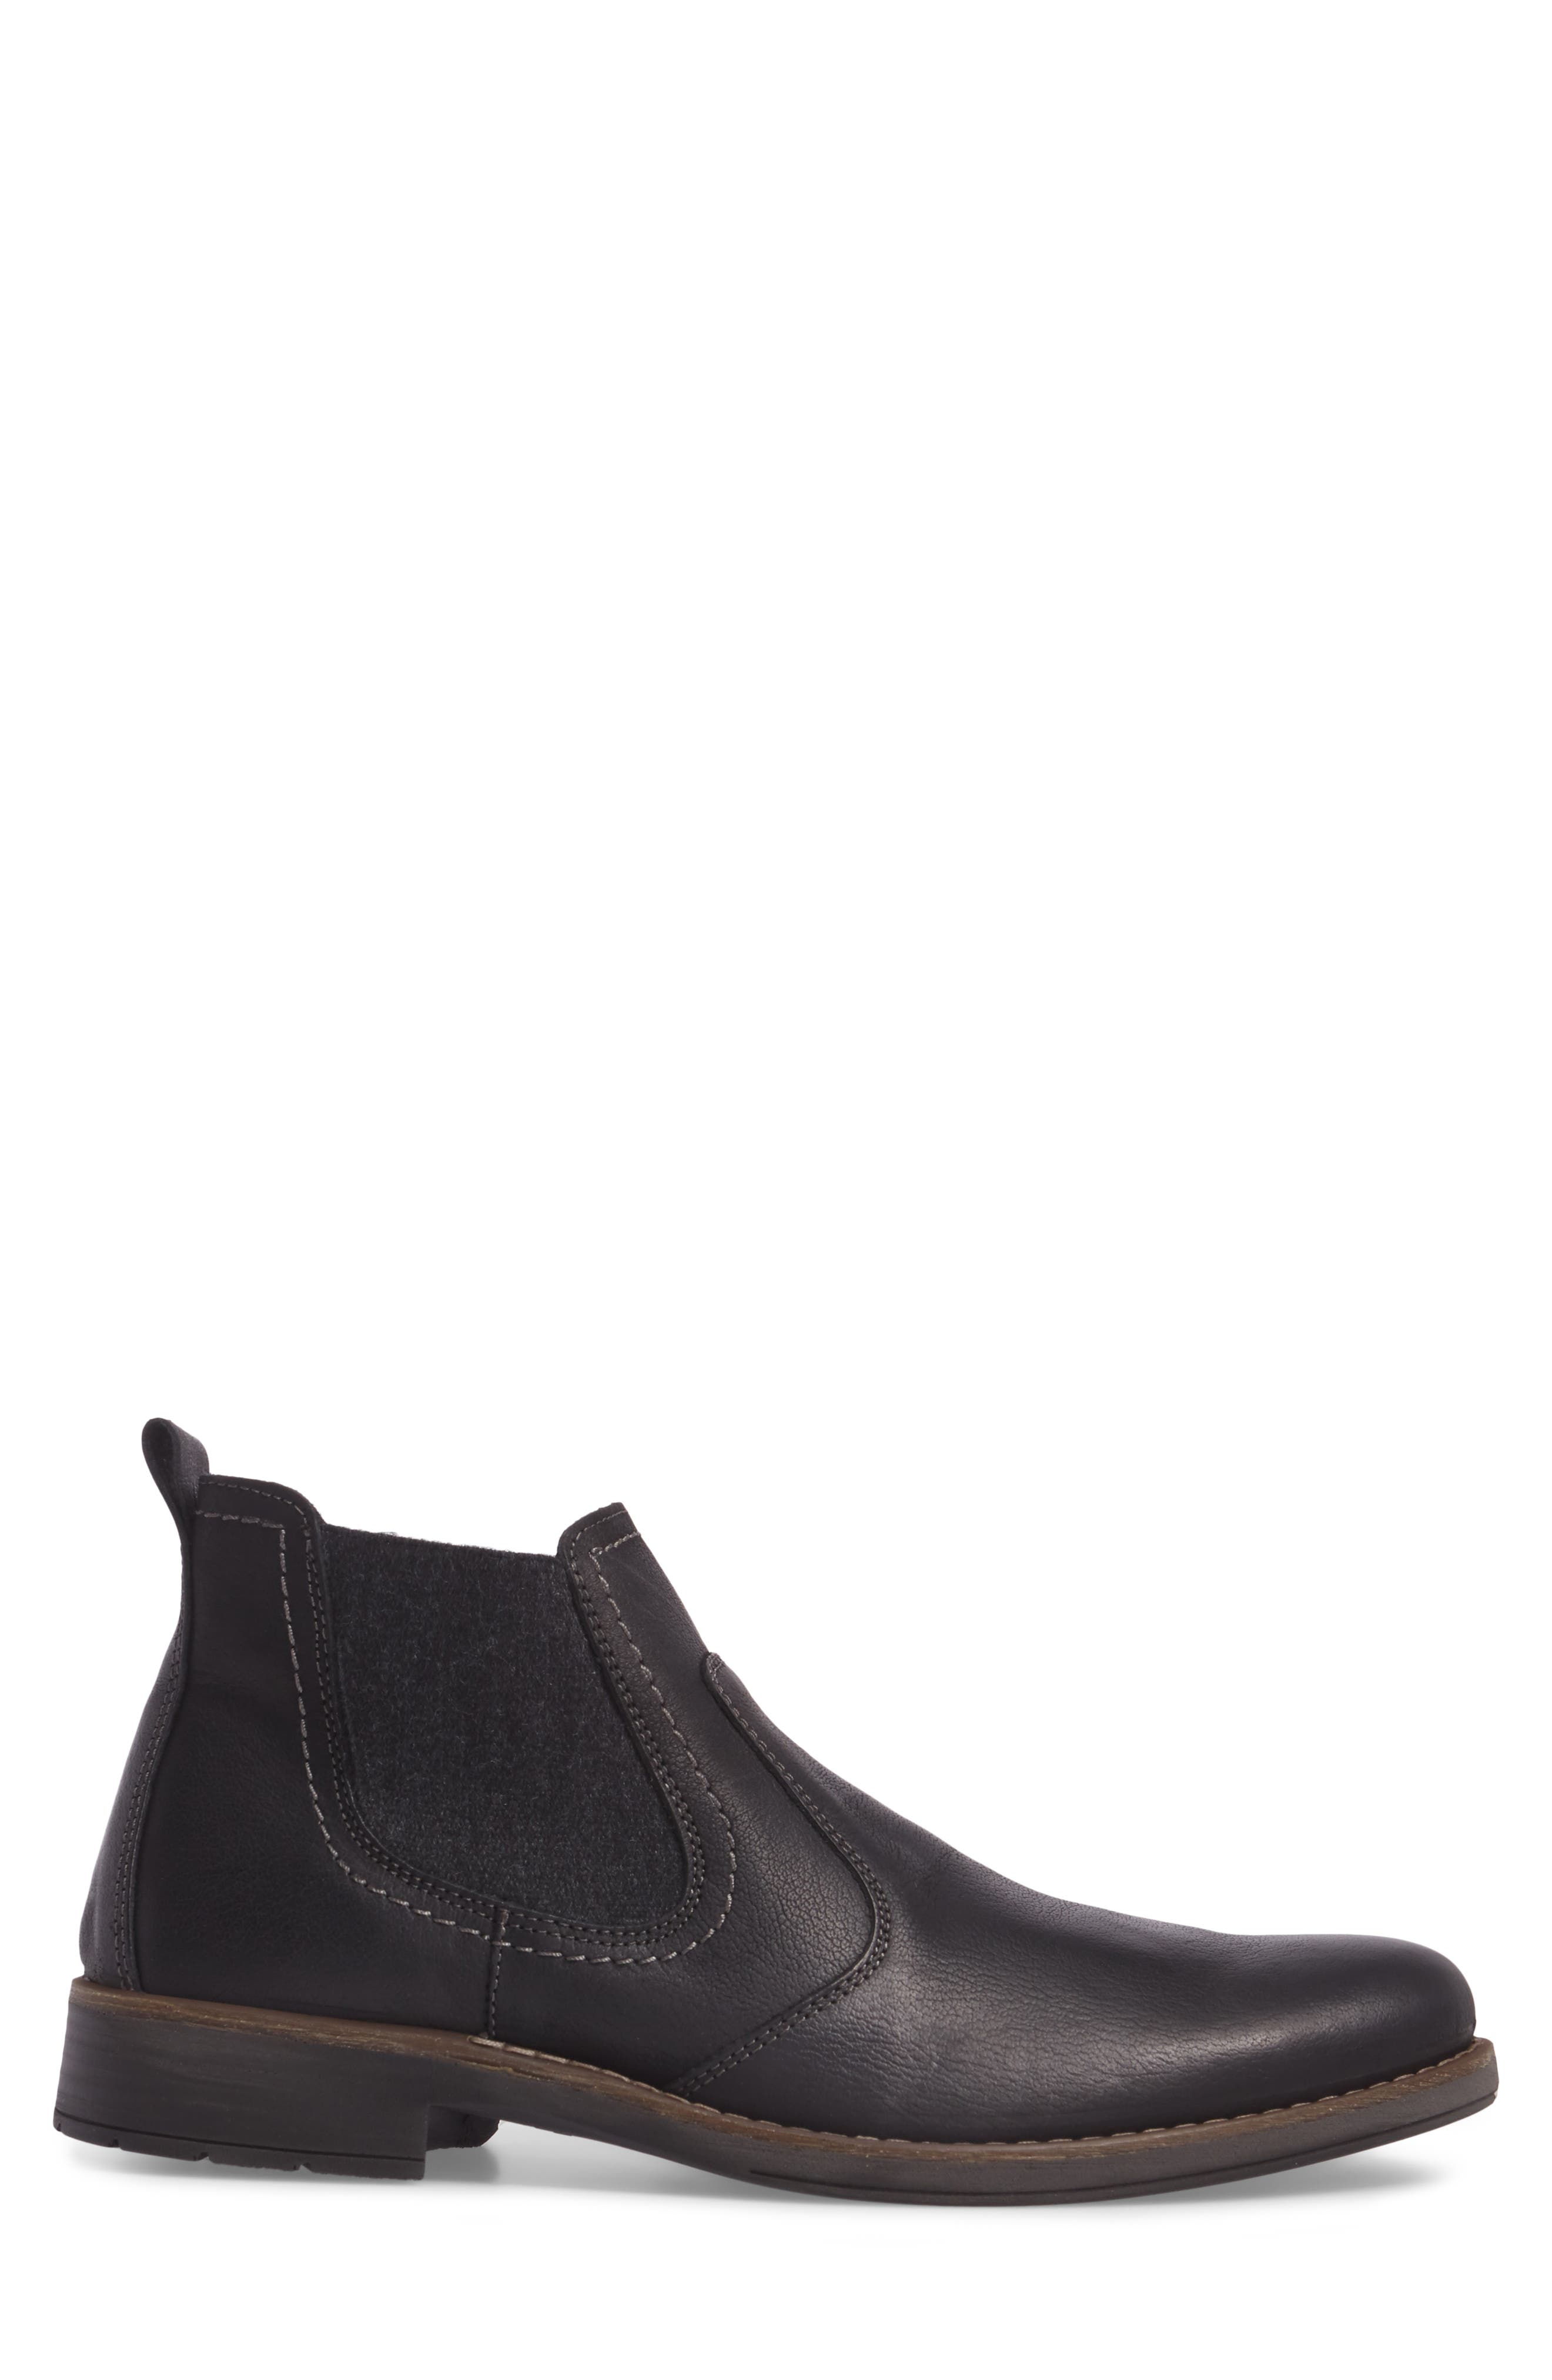 Spokane Chelsea Boot,                             Alternate thumbnail 3, color,                             Black Leather